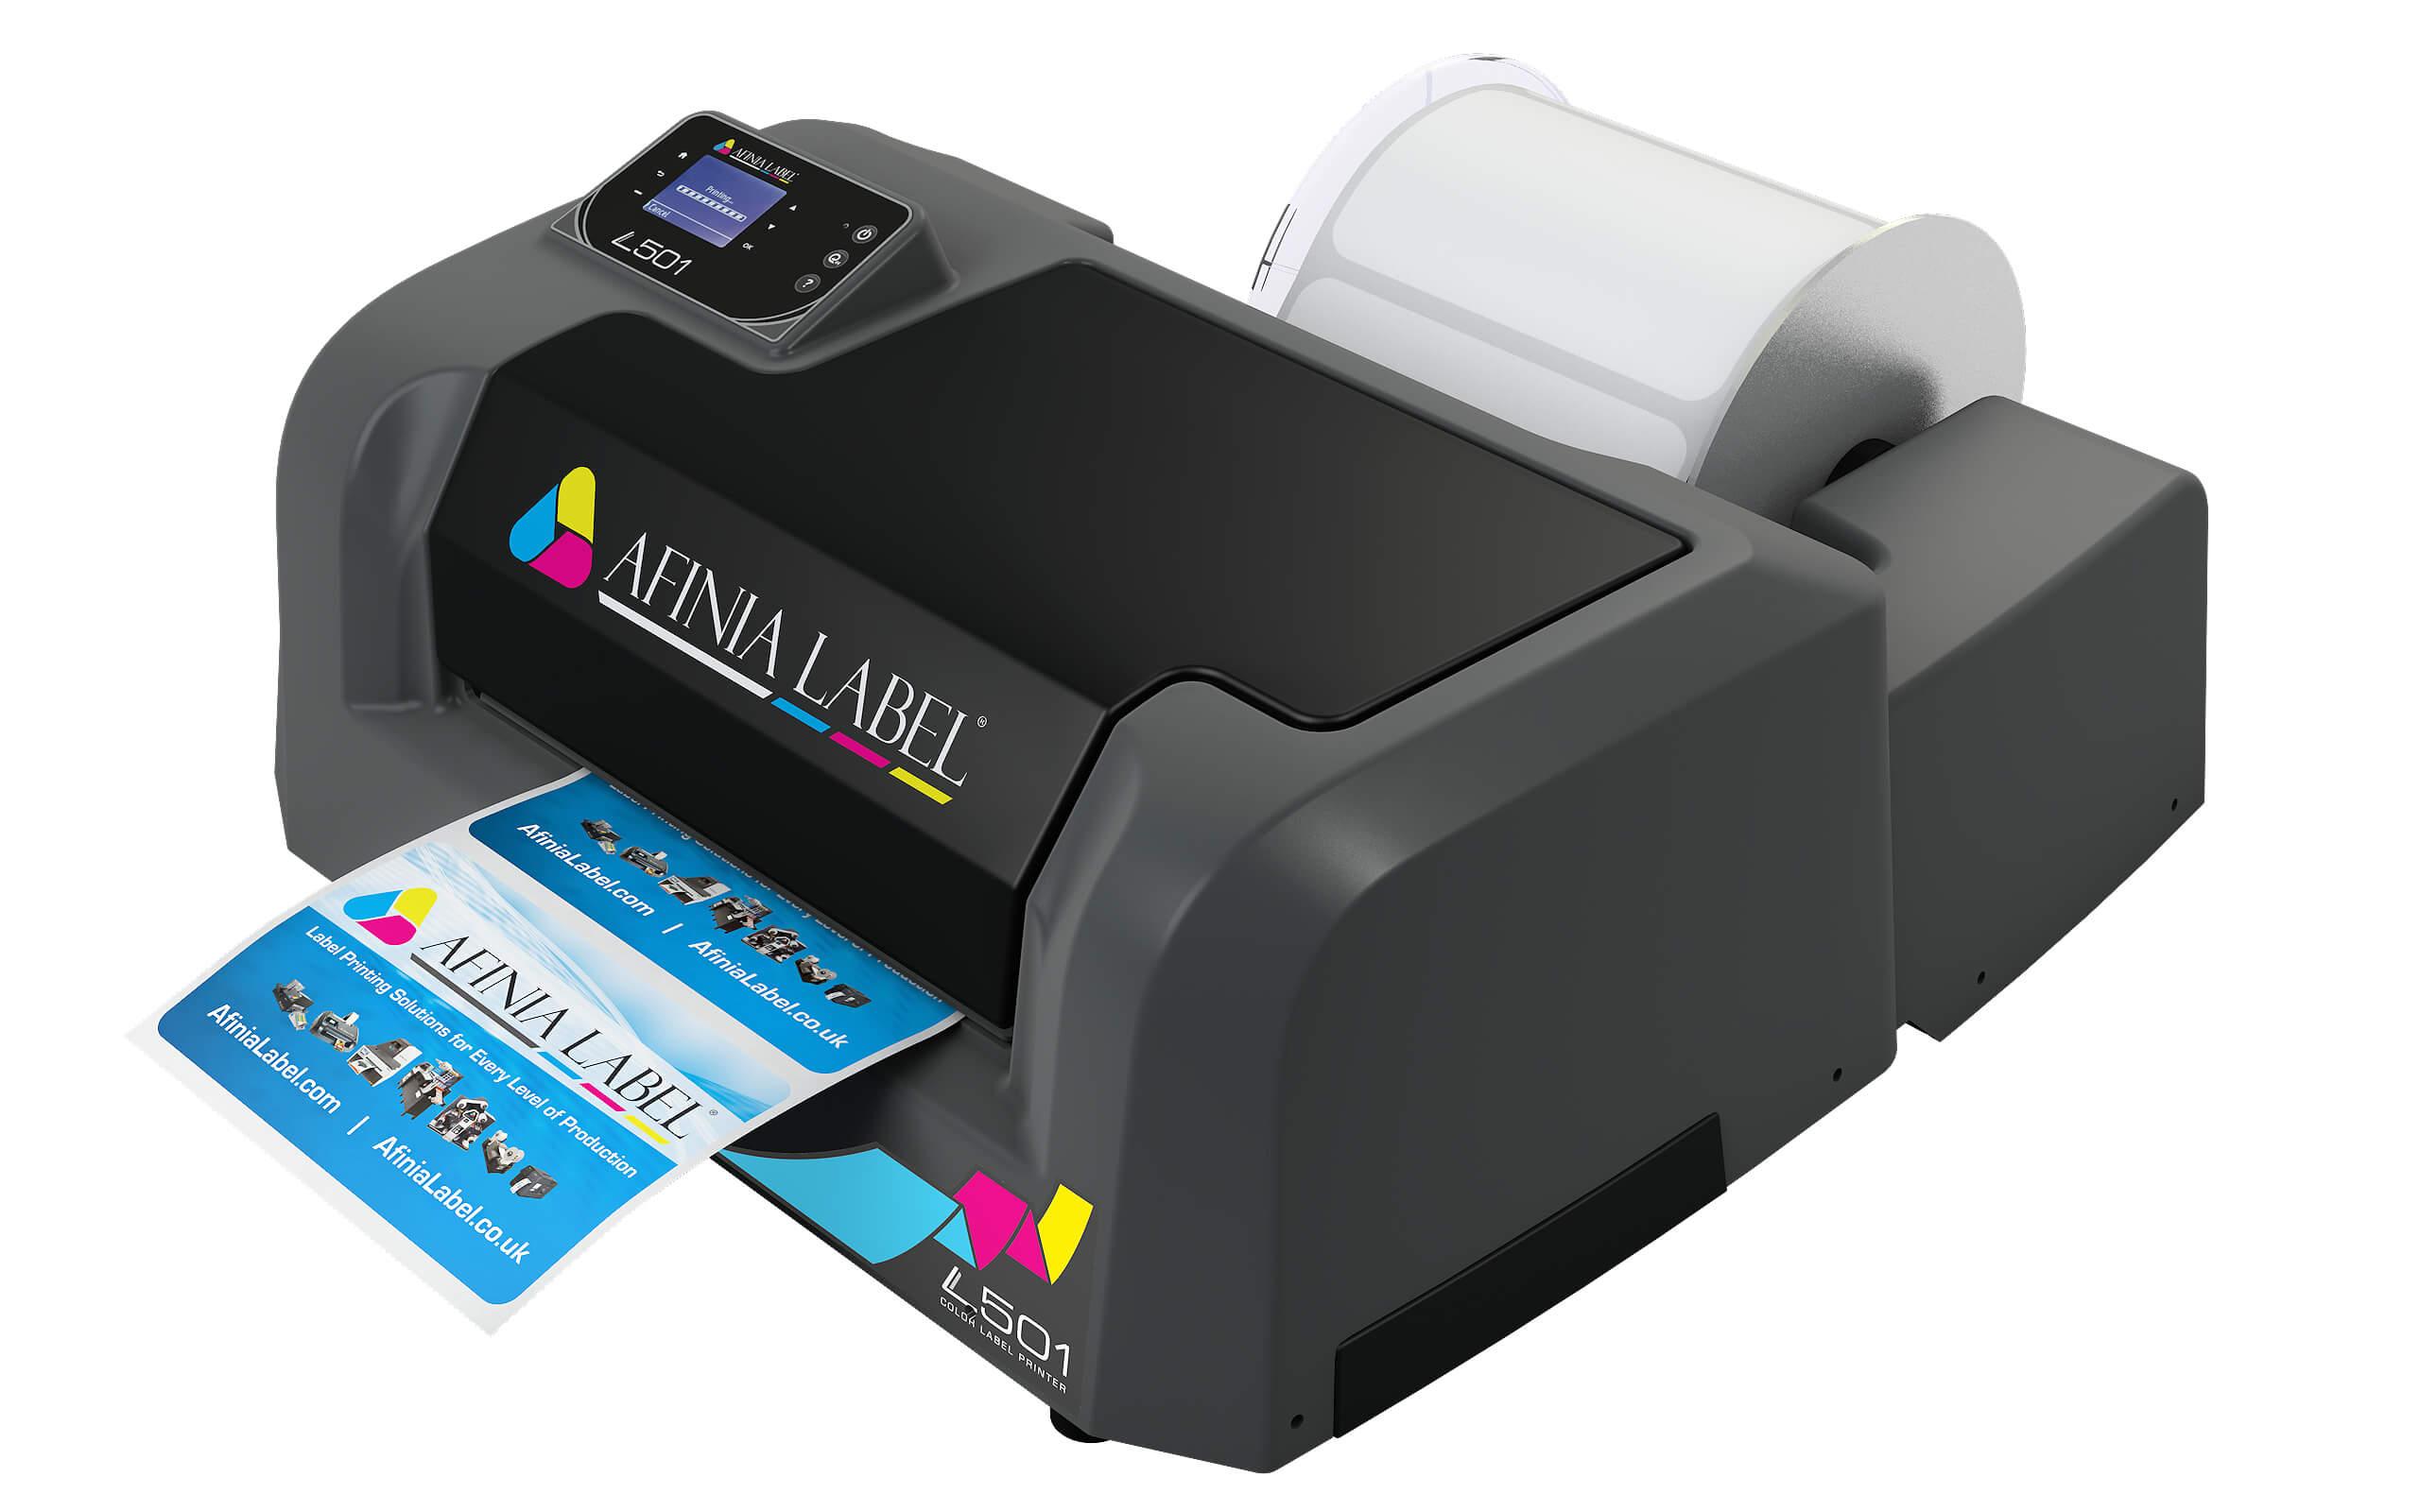 Afinia L501 Digital Color Label Printer